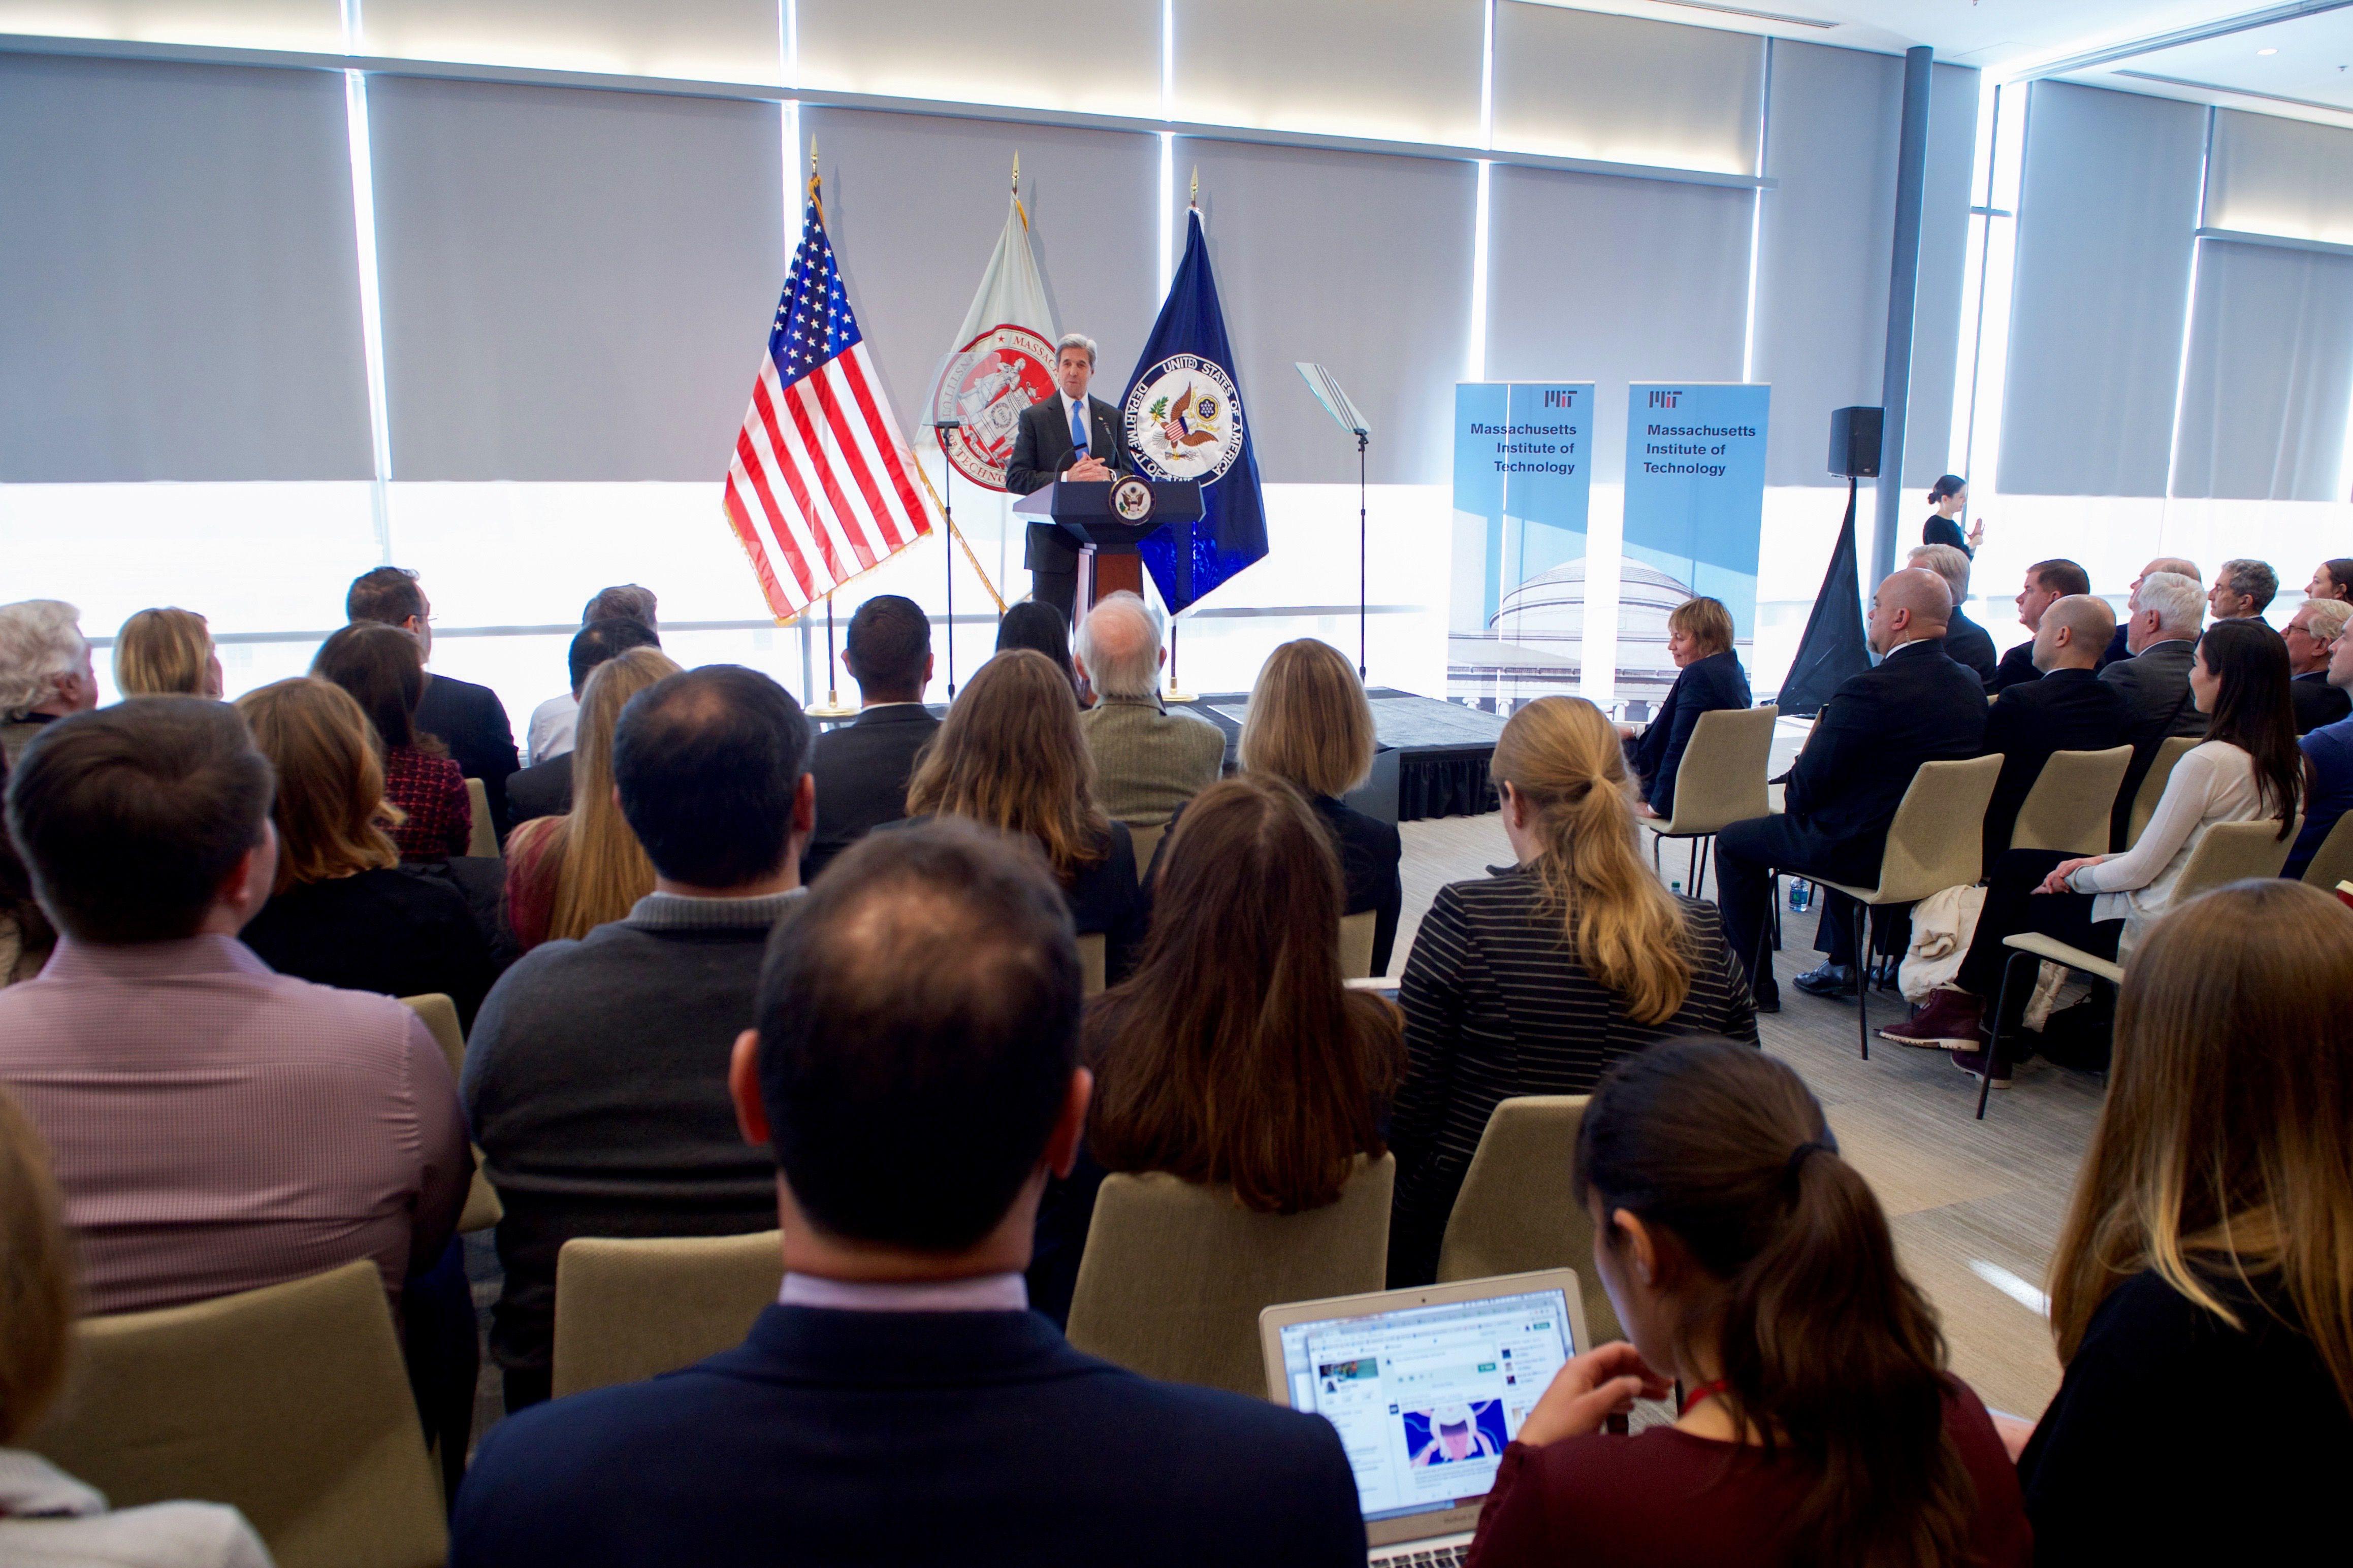 U.S. Secretary of State John Kerry at the Massachusetts Institute of Technology Sloan School of Management in Cambridge, Massachusetts